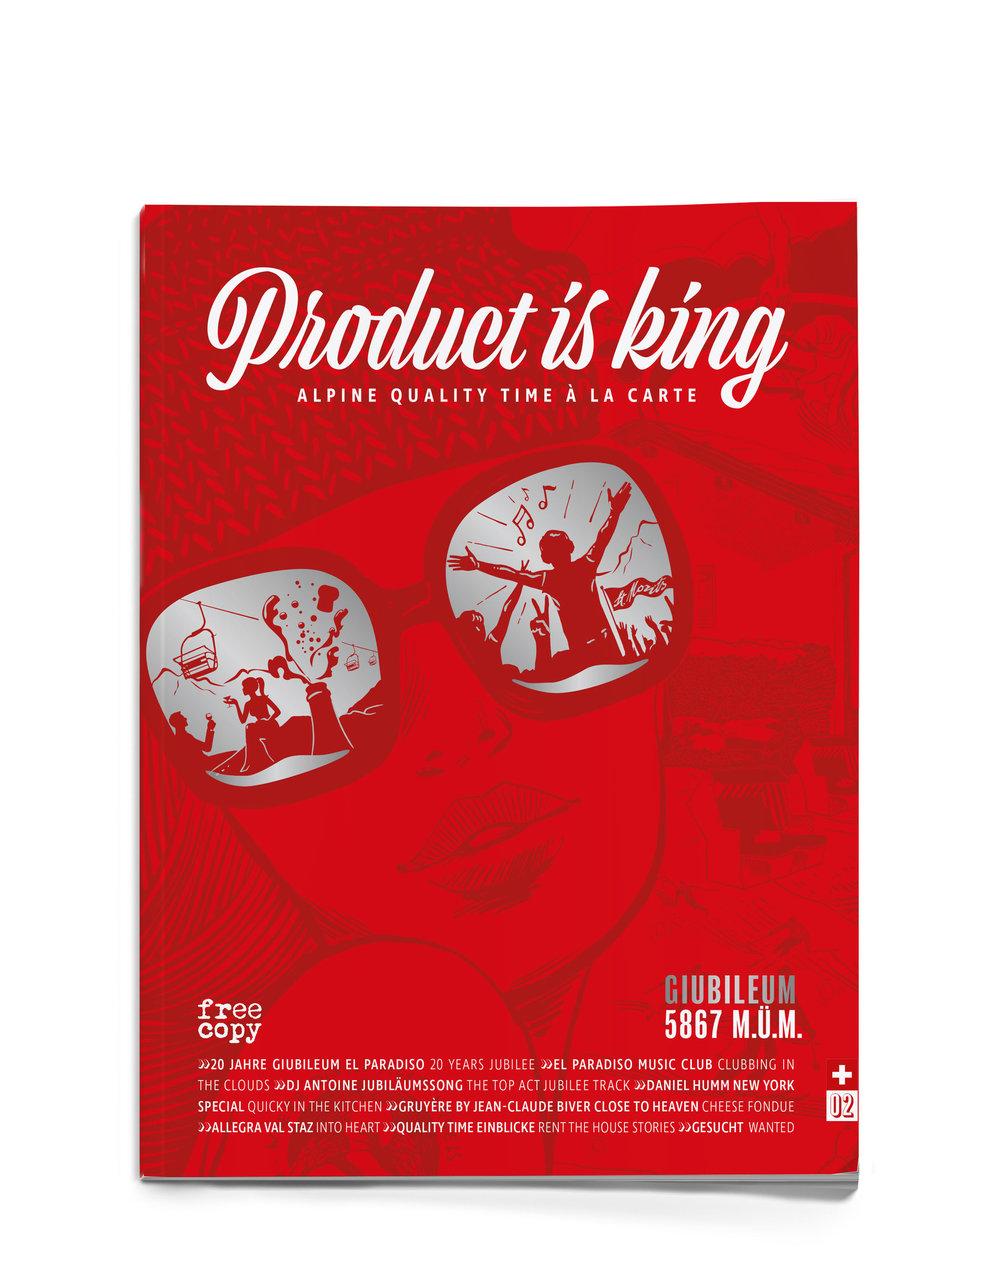 uppergrade-product-is-king-02.jpg